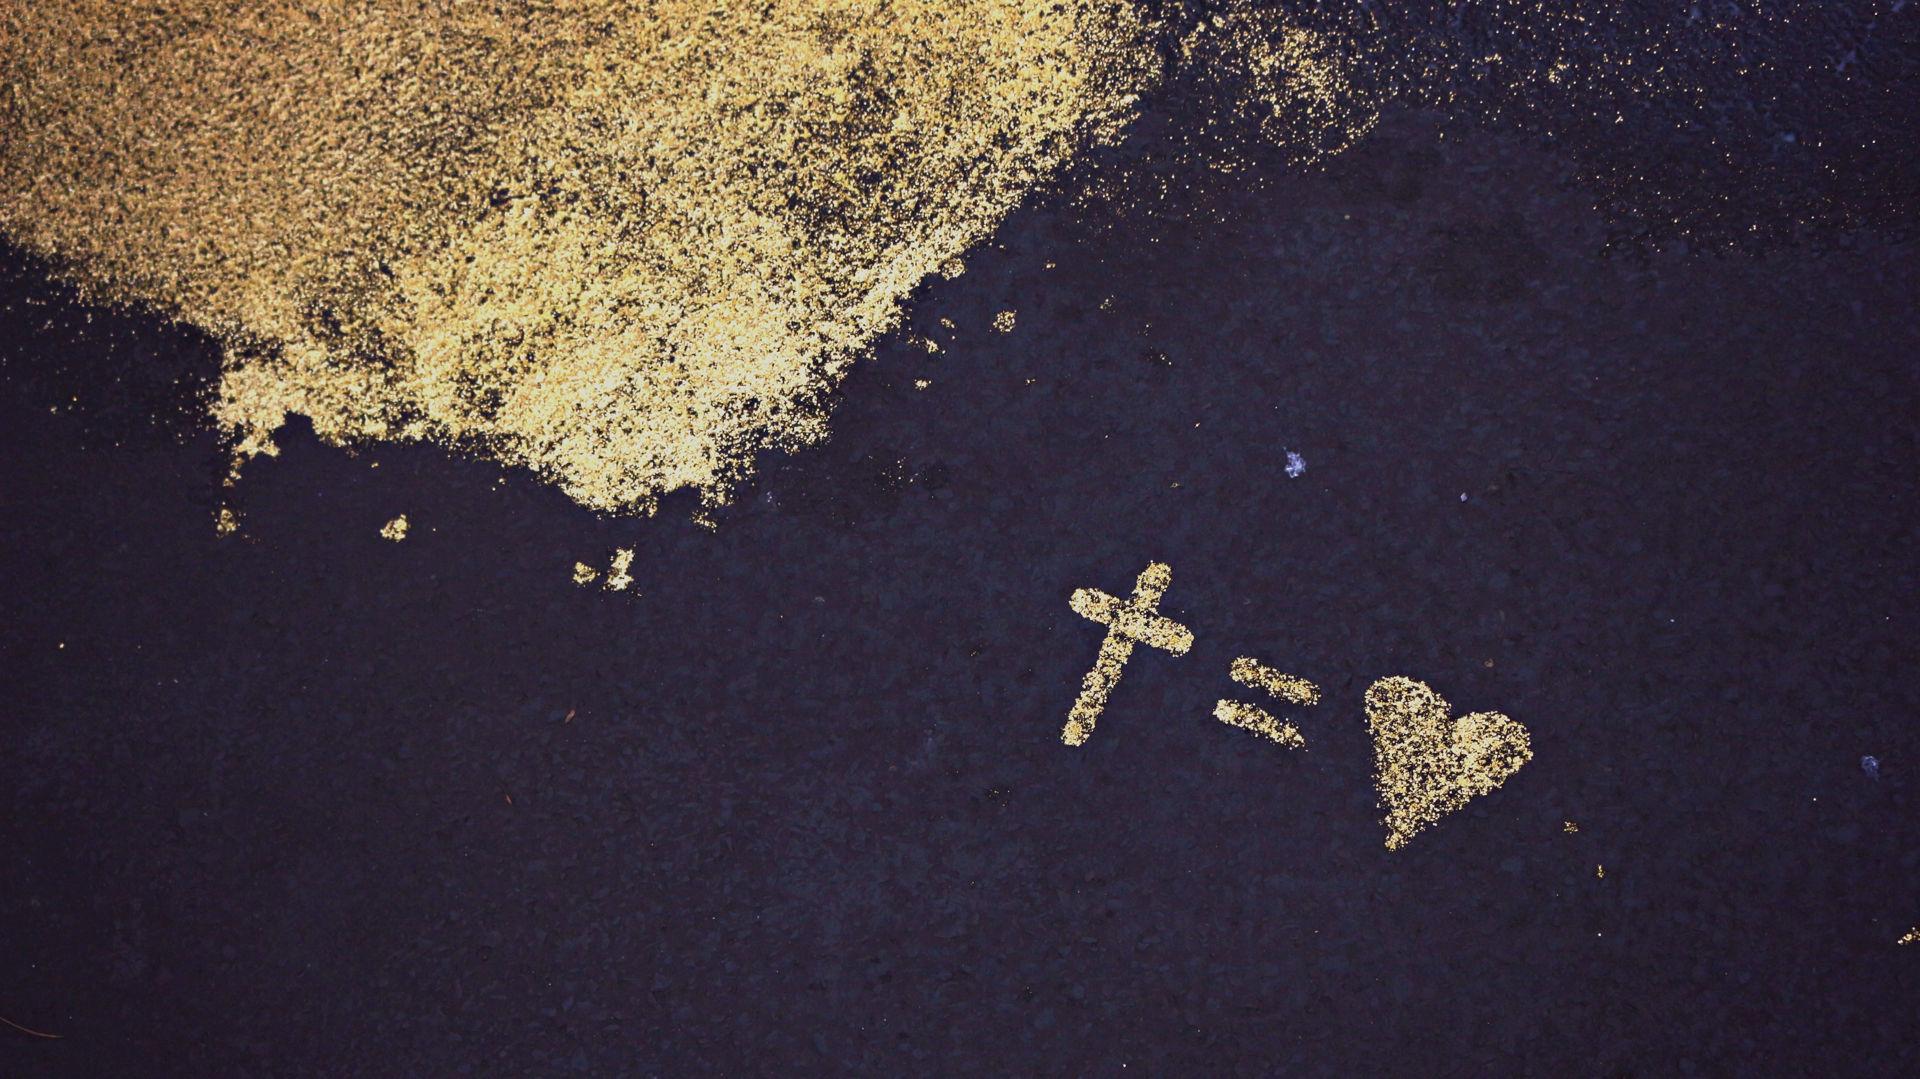 Jesus = Faith in Humanity = Love